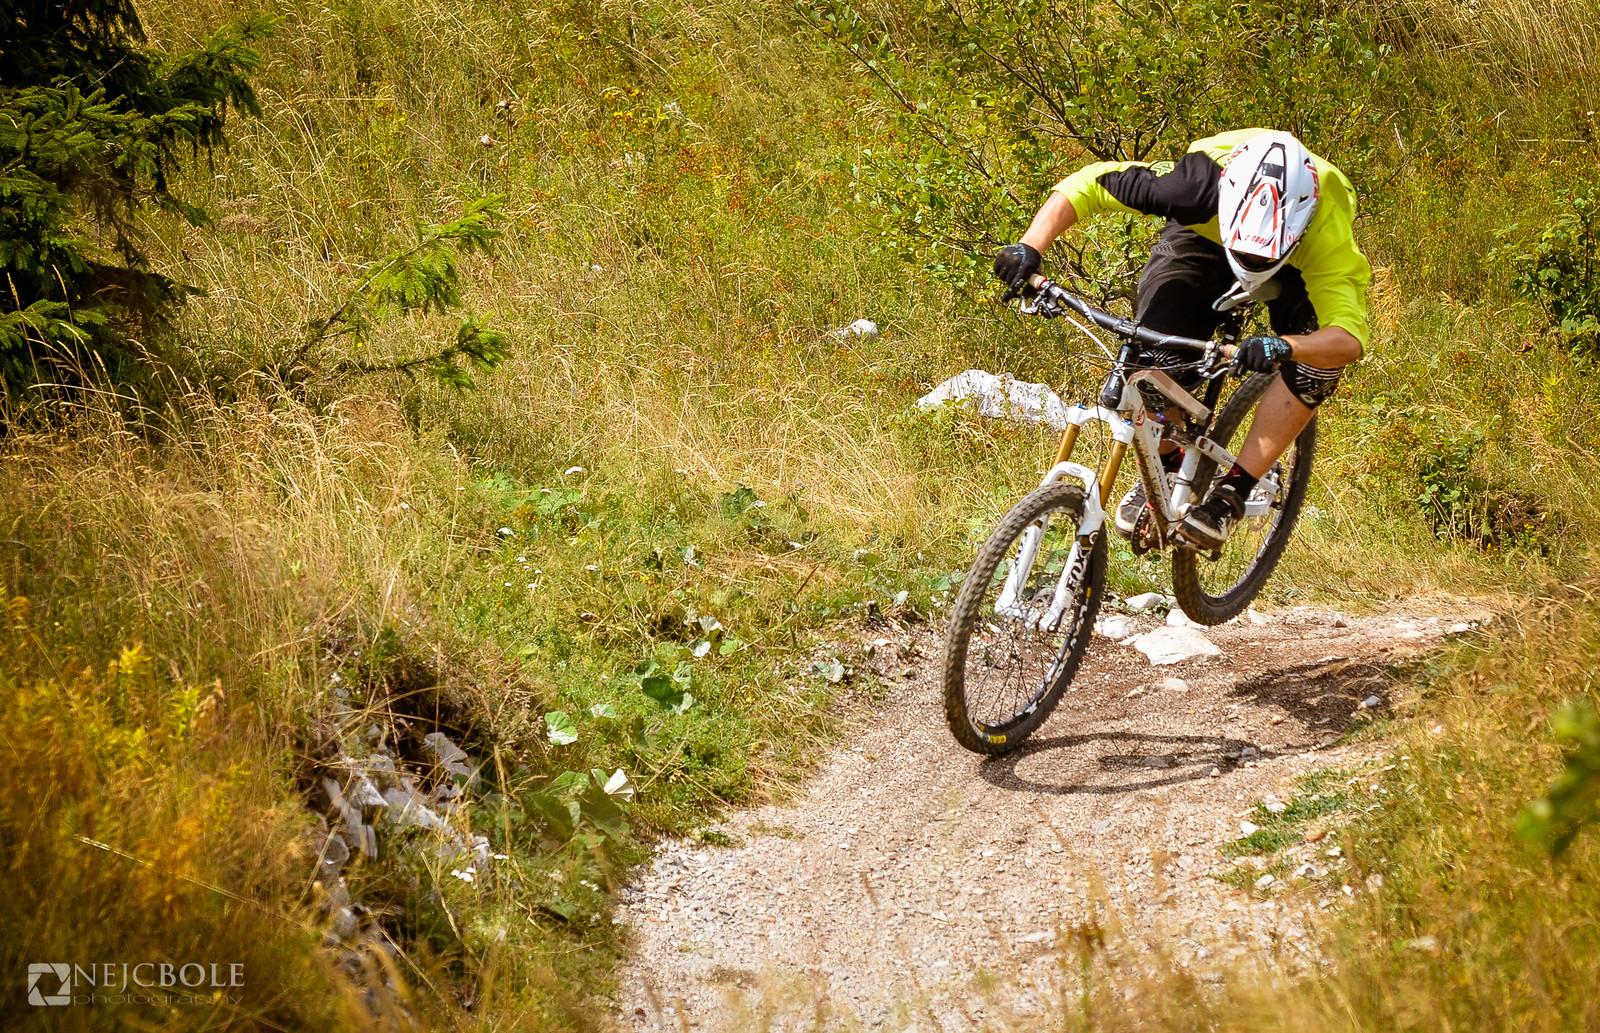 IMG 0522 - kamplc - Mountain Biking Pictures - Vital MTB